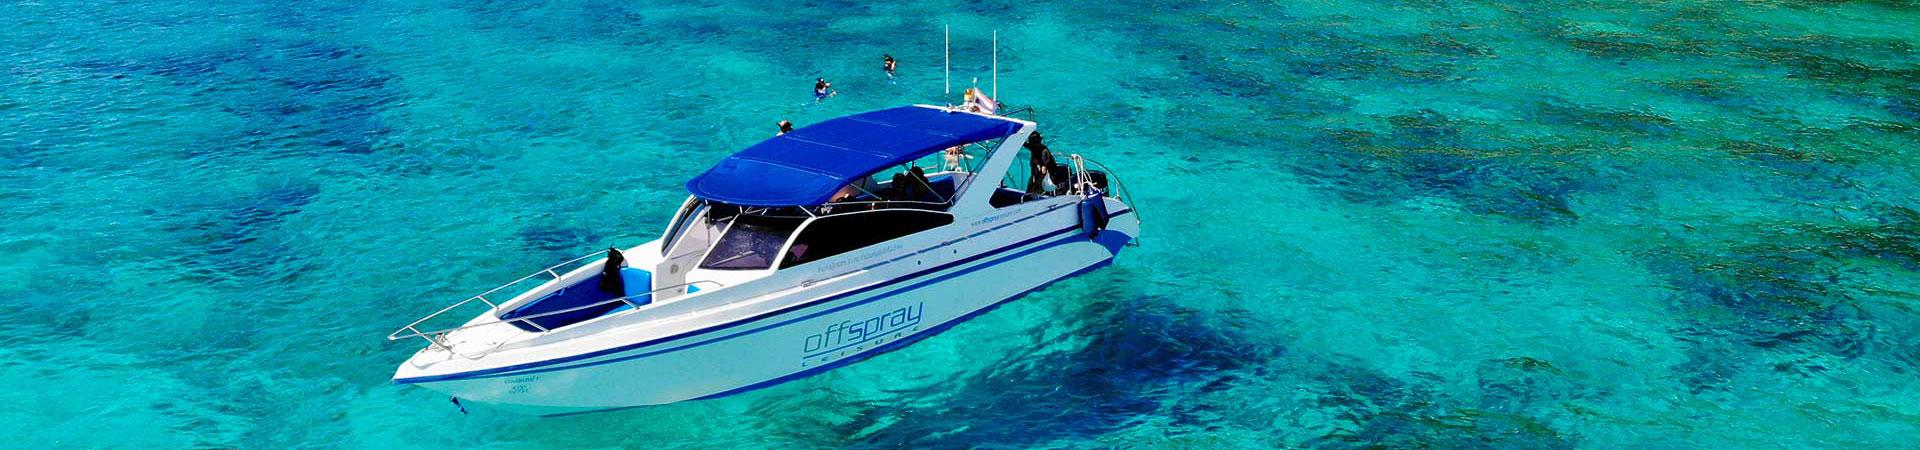 Private Boat Rental Phuket